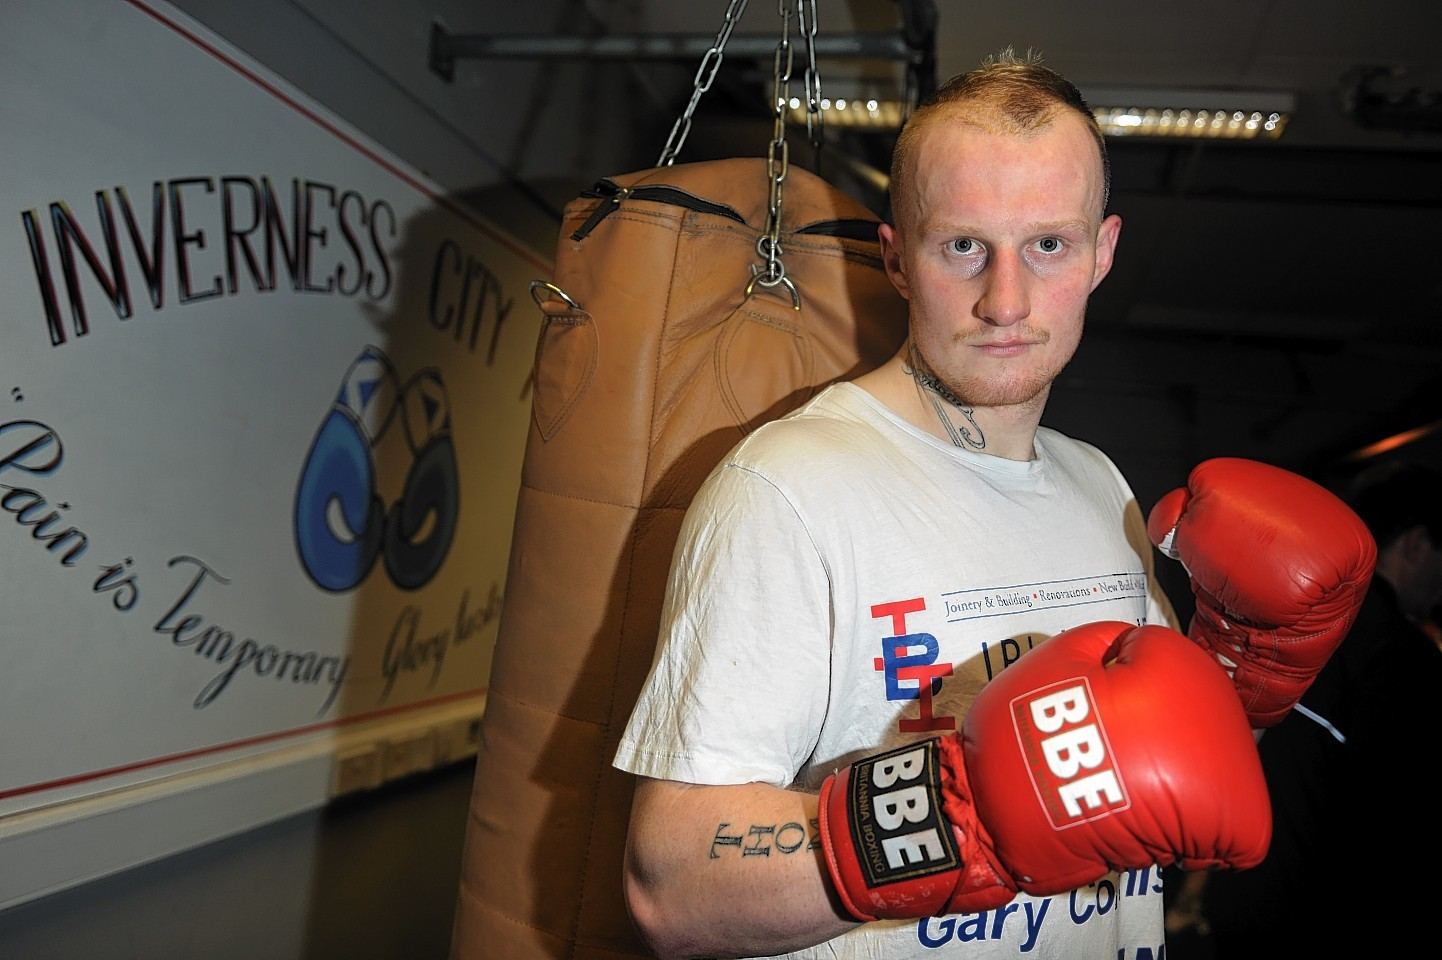 Highland heavyweight boxer Gary Cornish